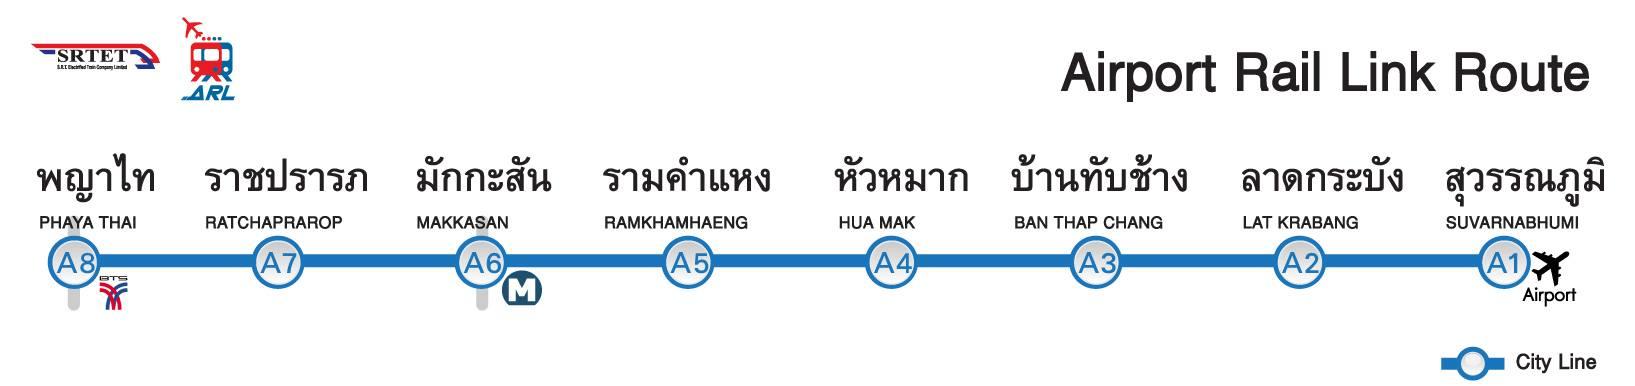 transport w bangkoku kolejka lotnisko arl skytrain cena